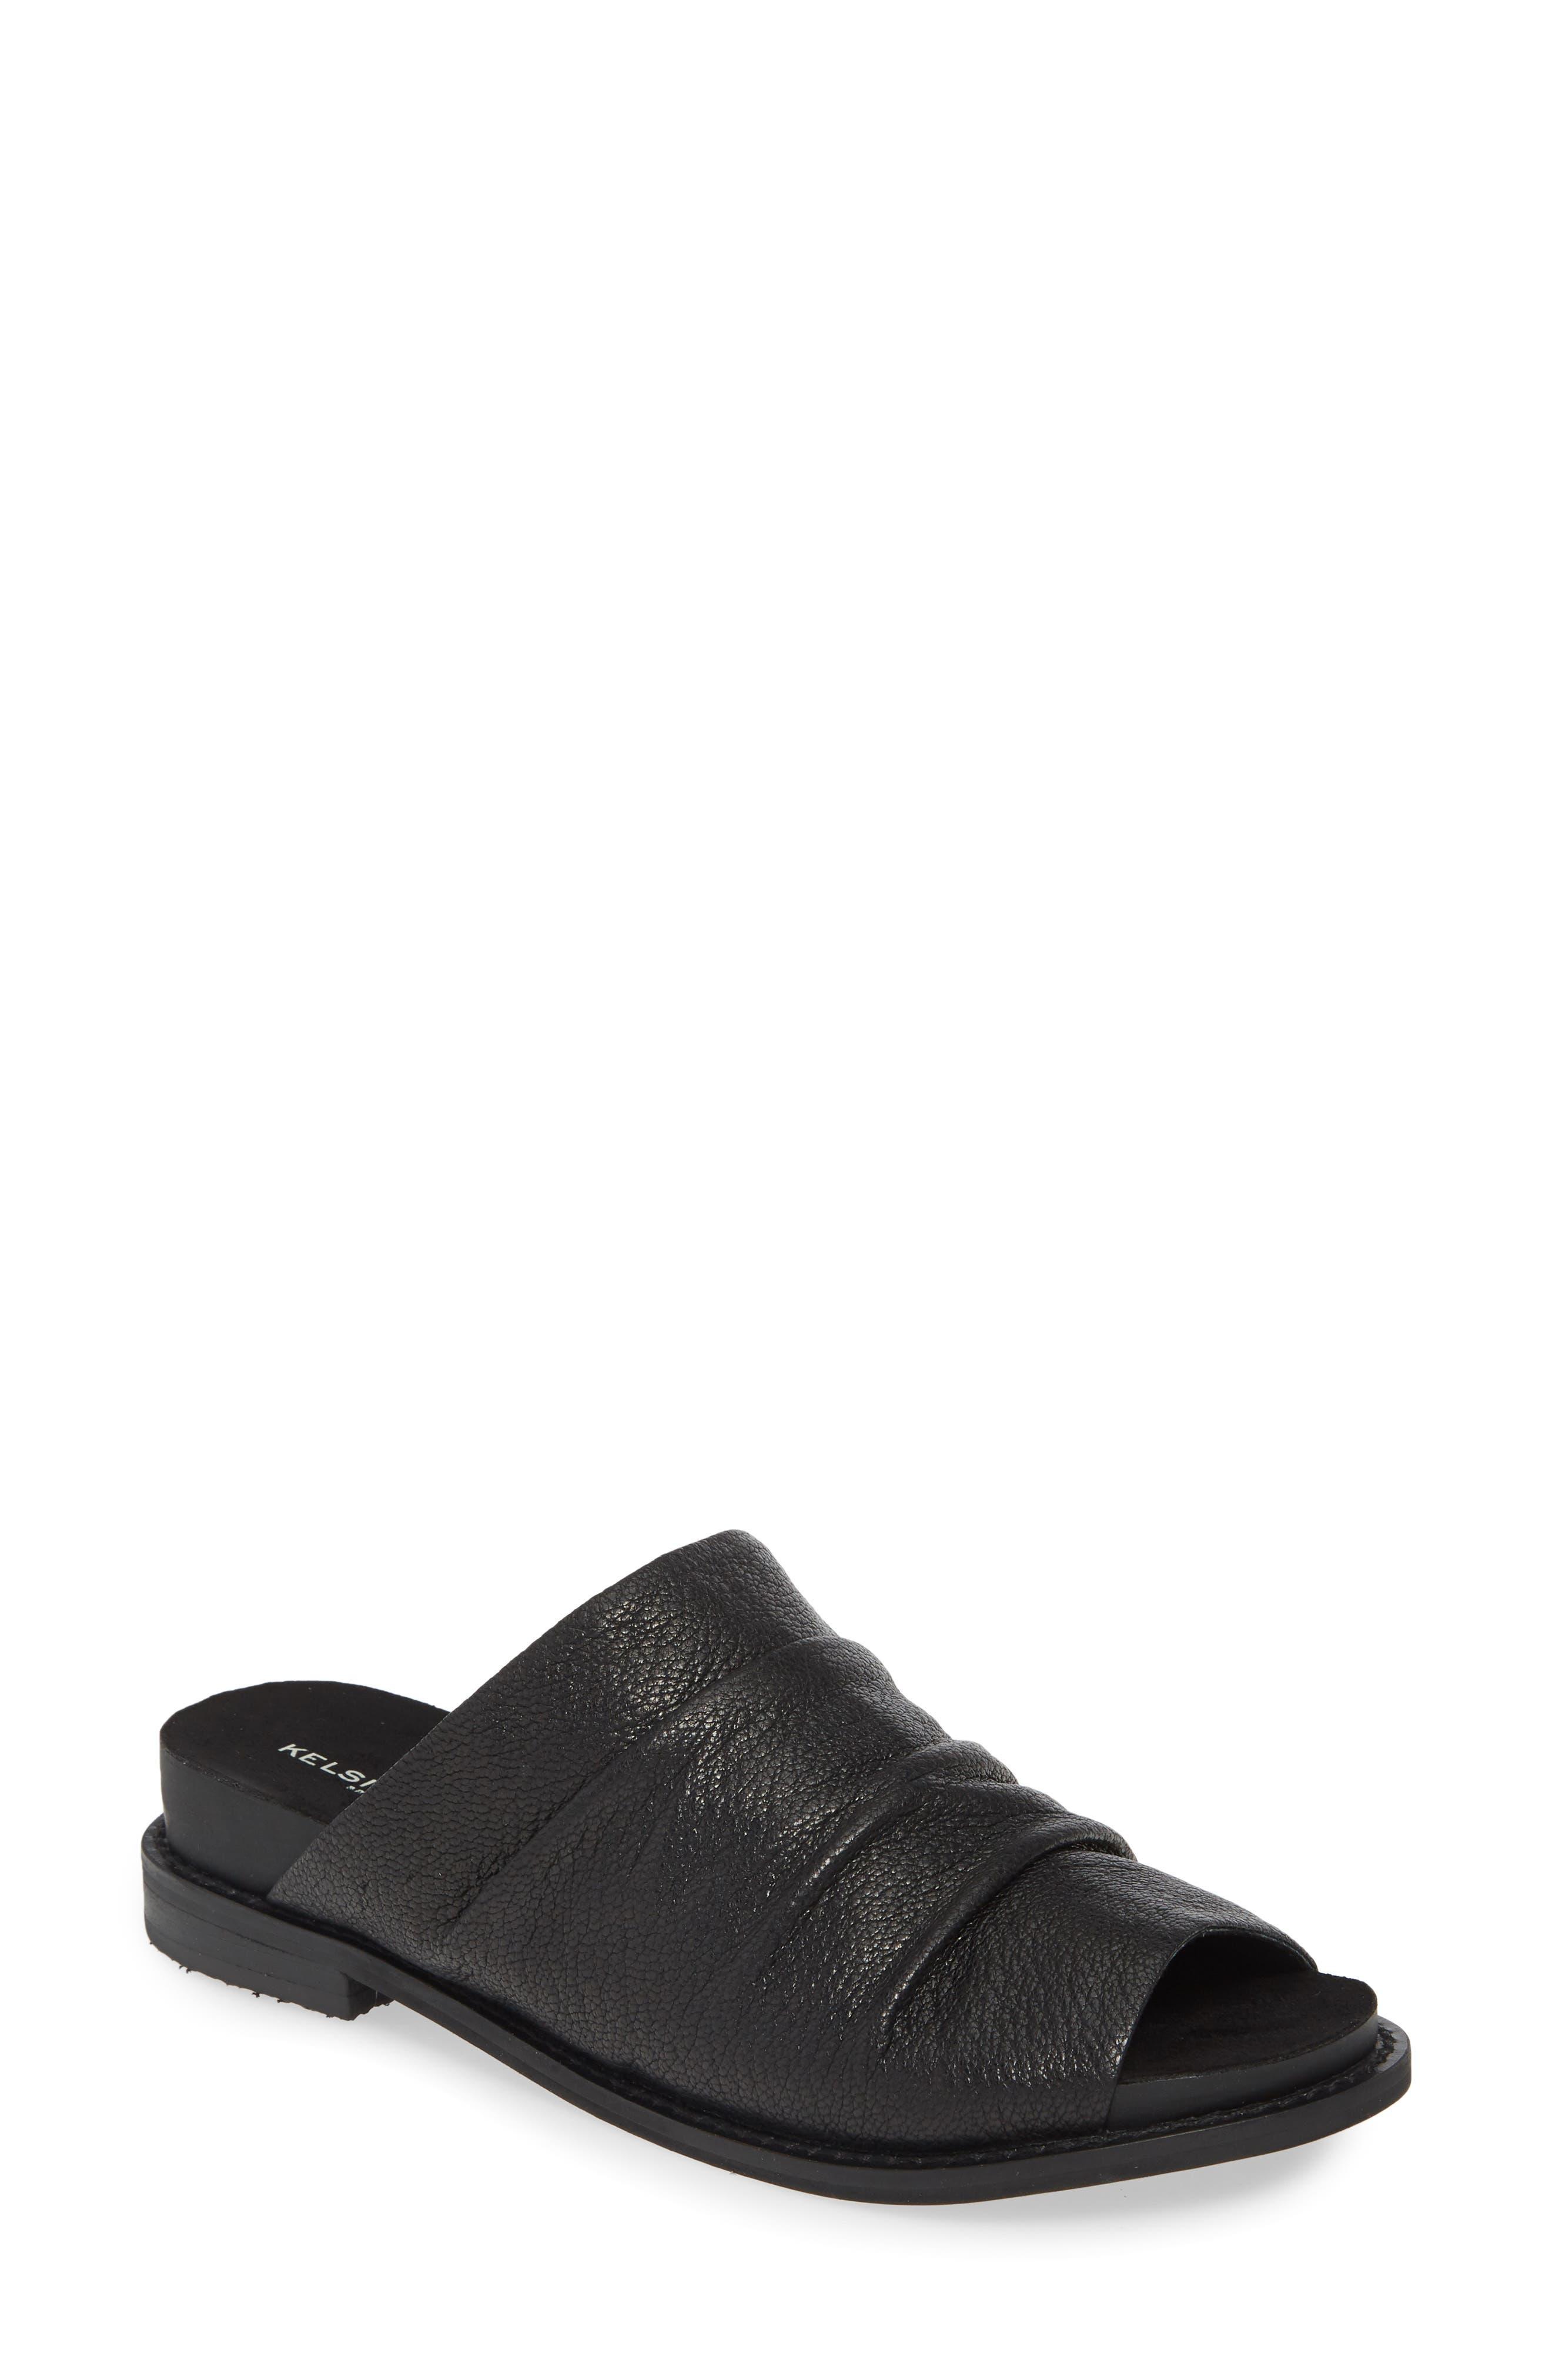 Kelsi Dagger Brooklyn Occupy Slide Sandal- Black